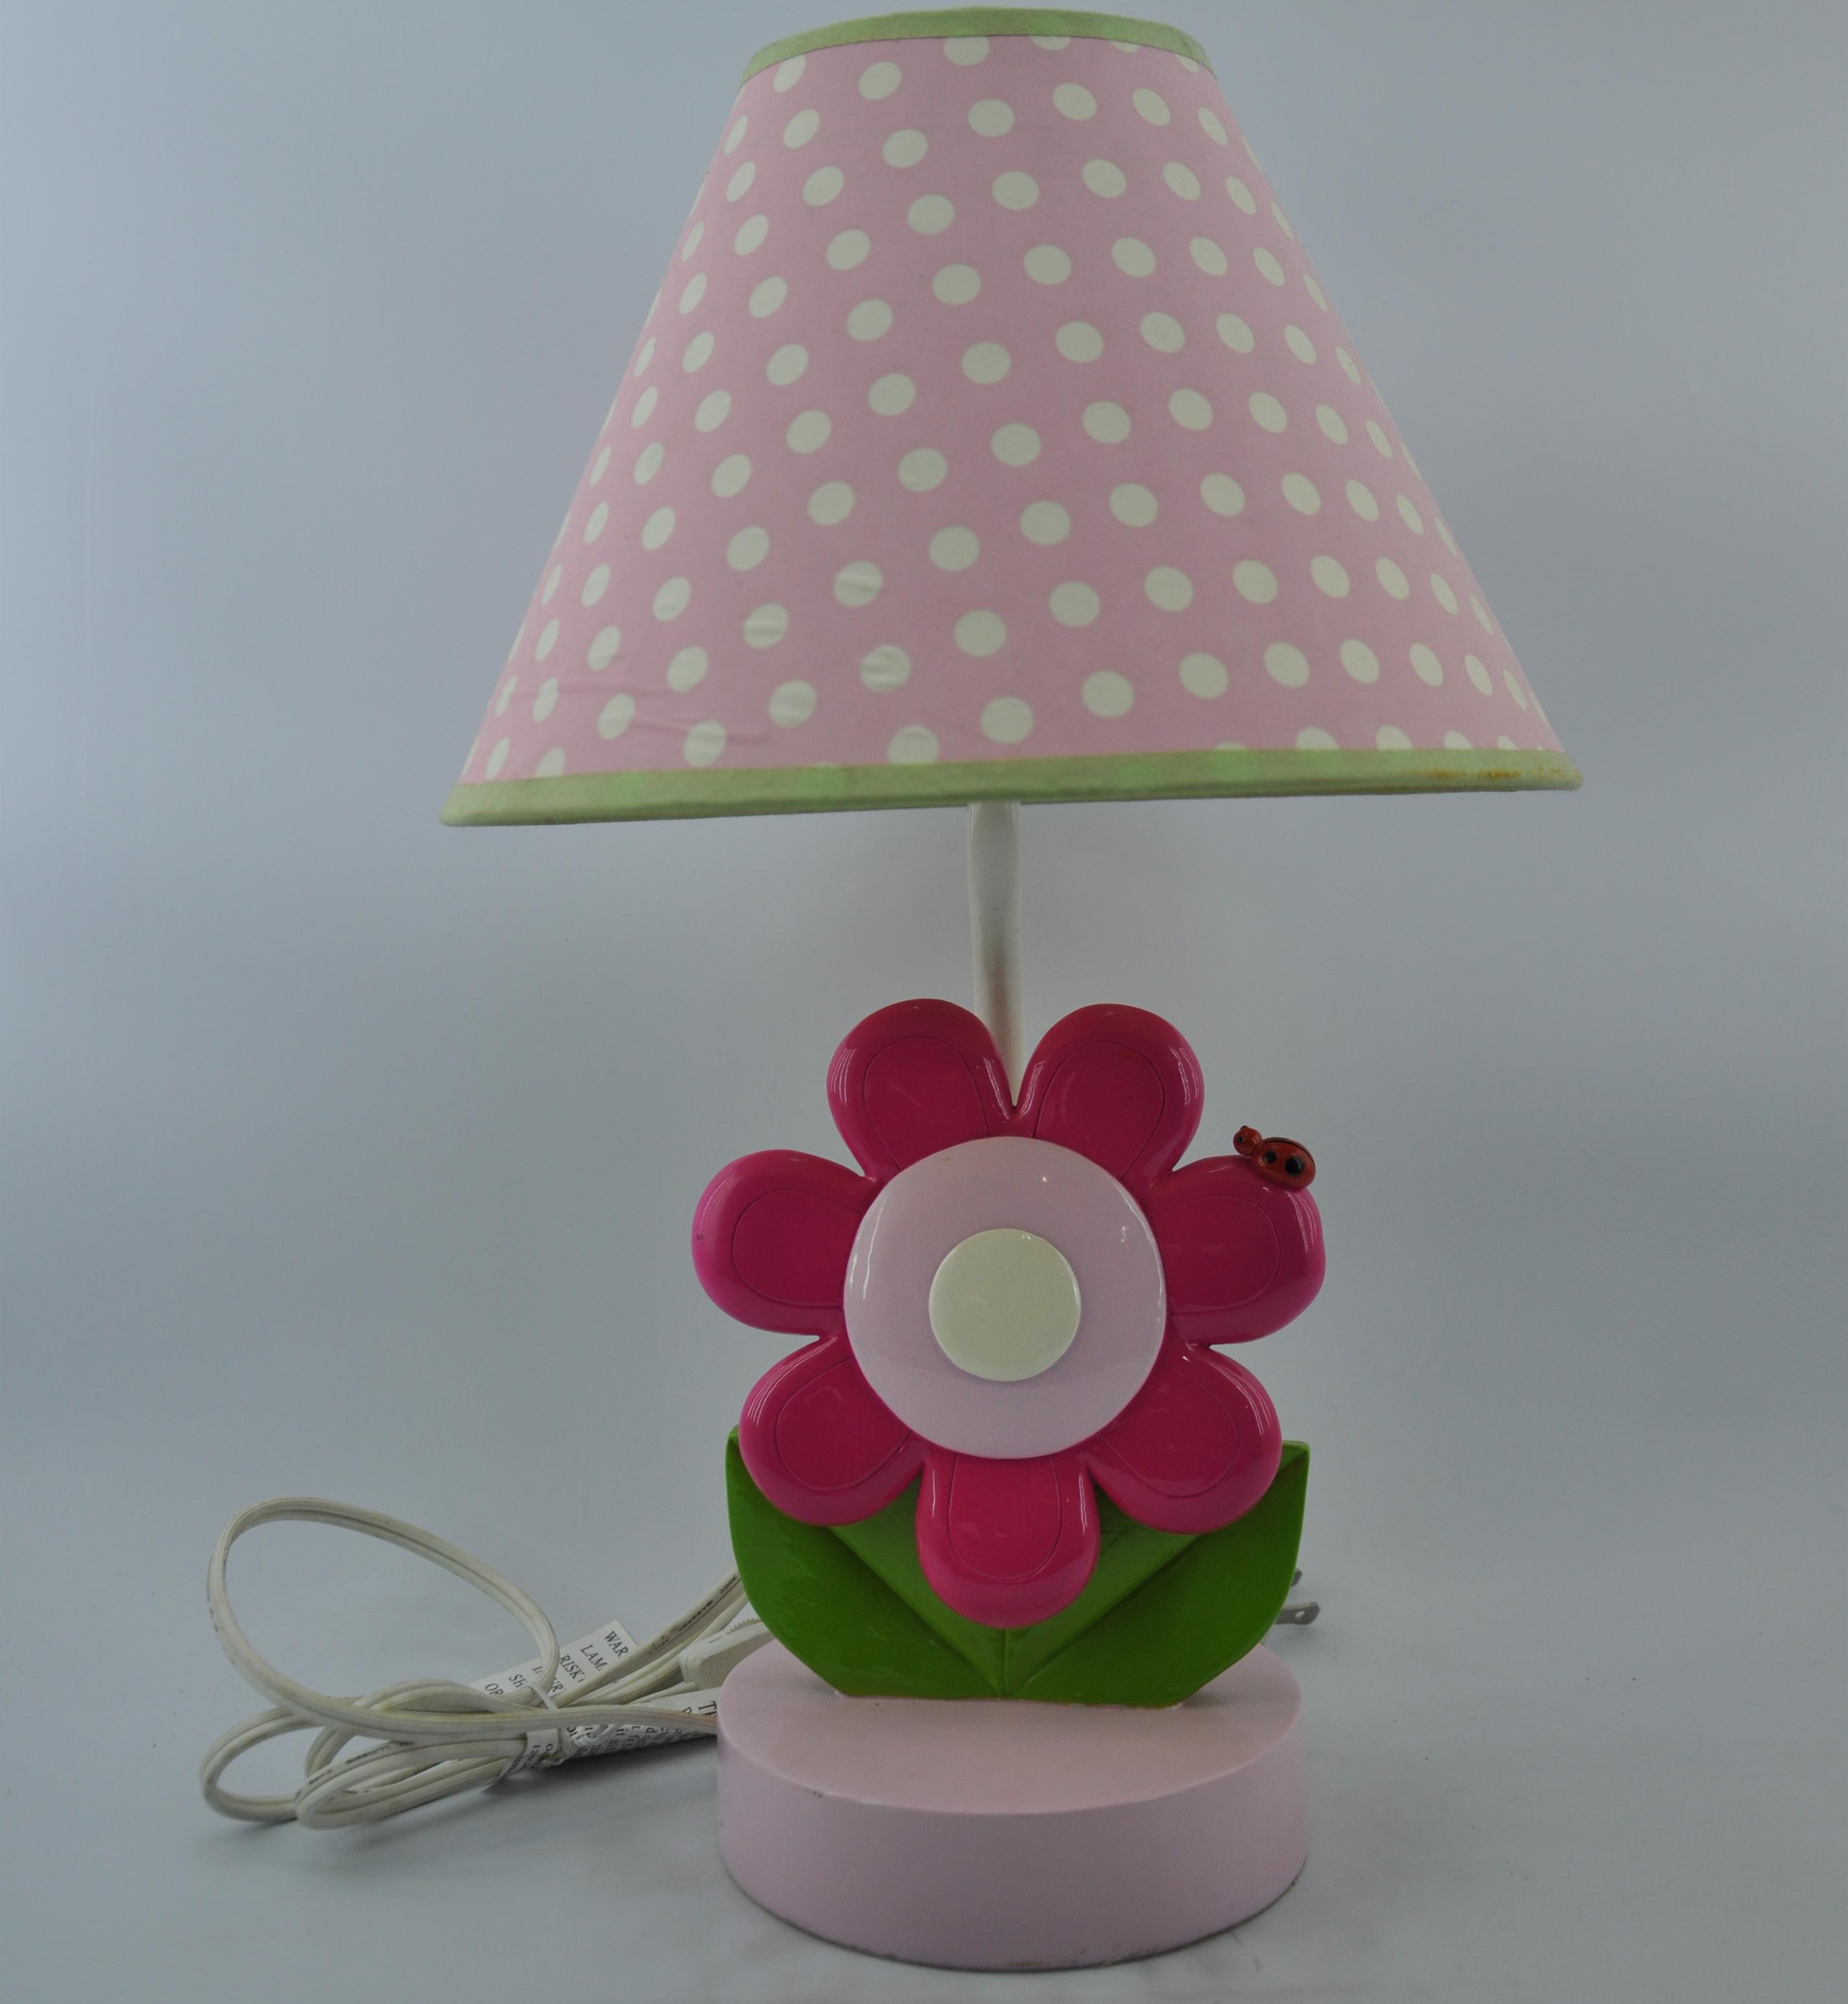 Hot Sale Childrens Gift Pink Sunflower Table Lamp Buy Sunflower